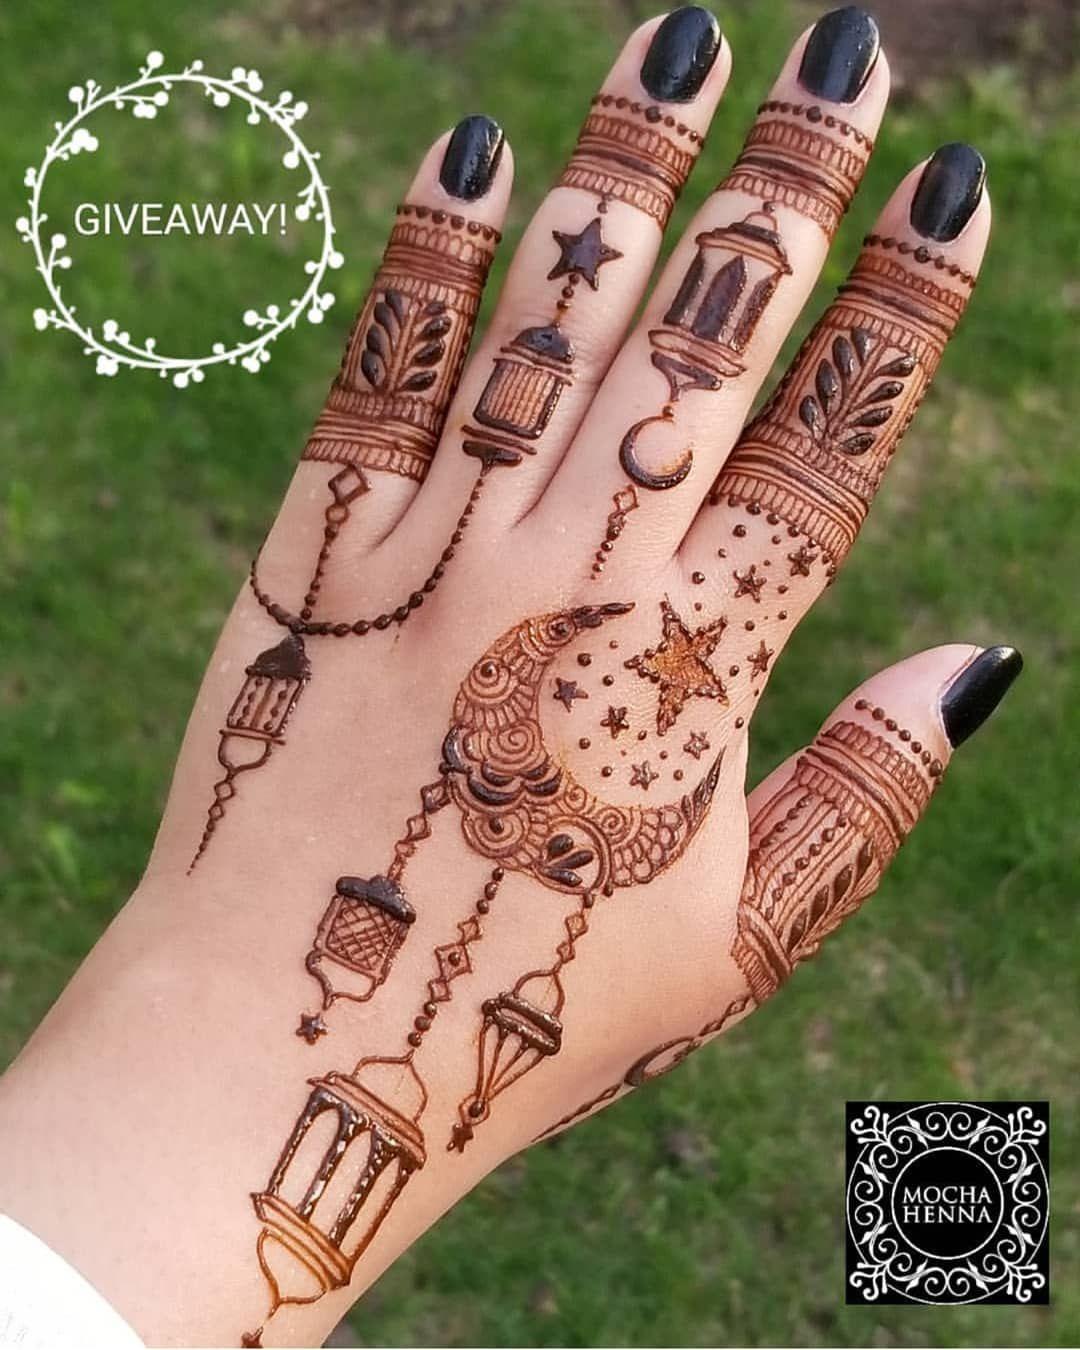 تصاميم حنه لشهر رمضان Henna Designs Hand Mehndi Designs For Fingers Henna